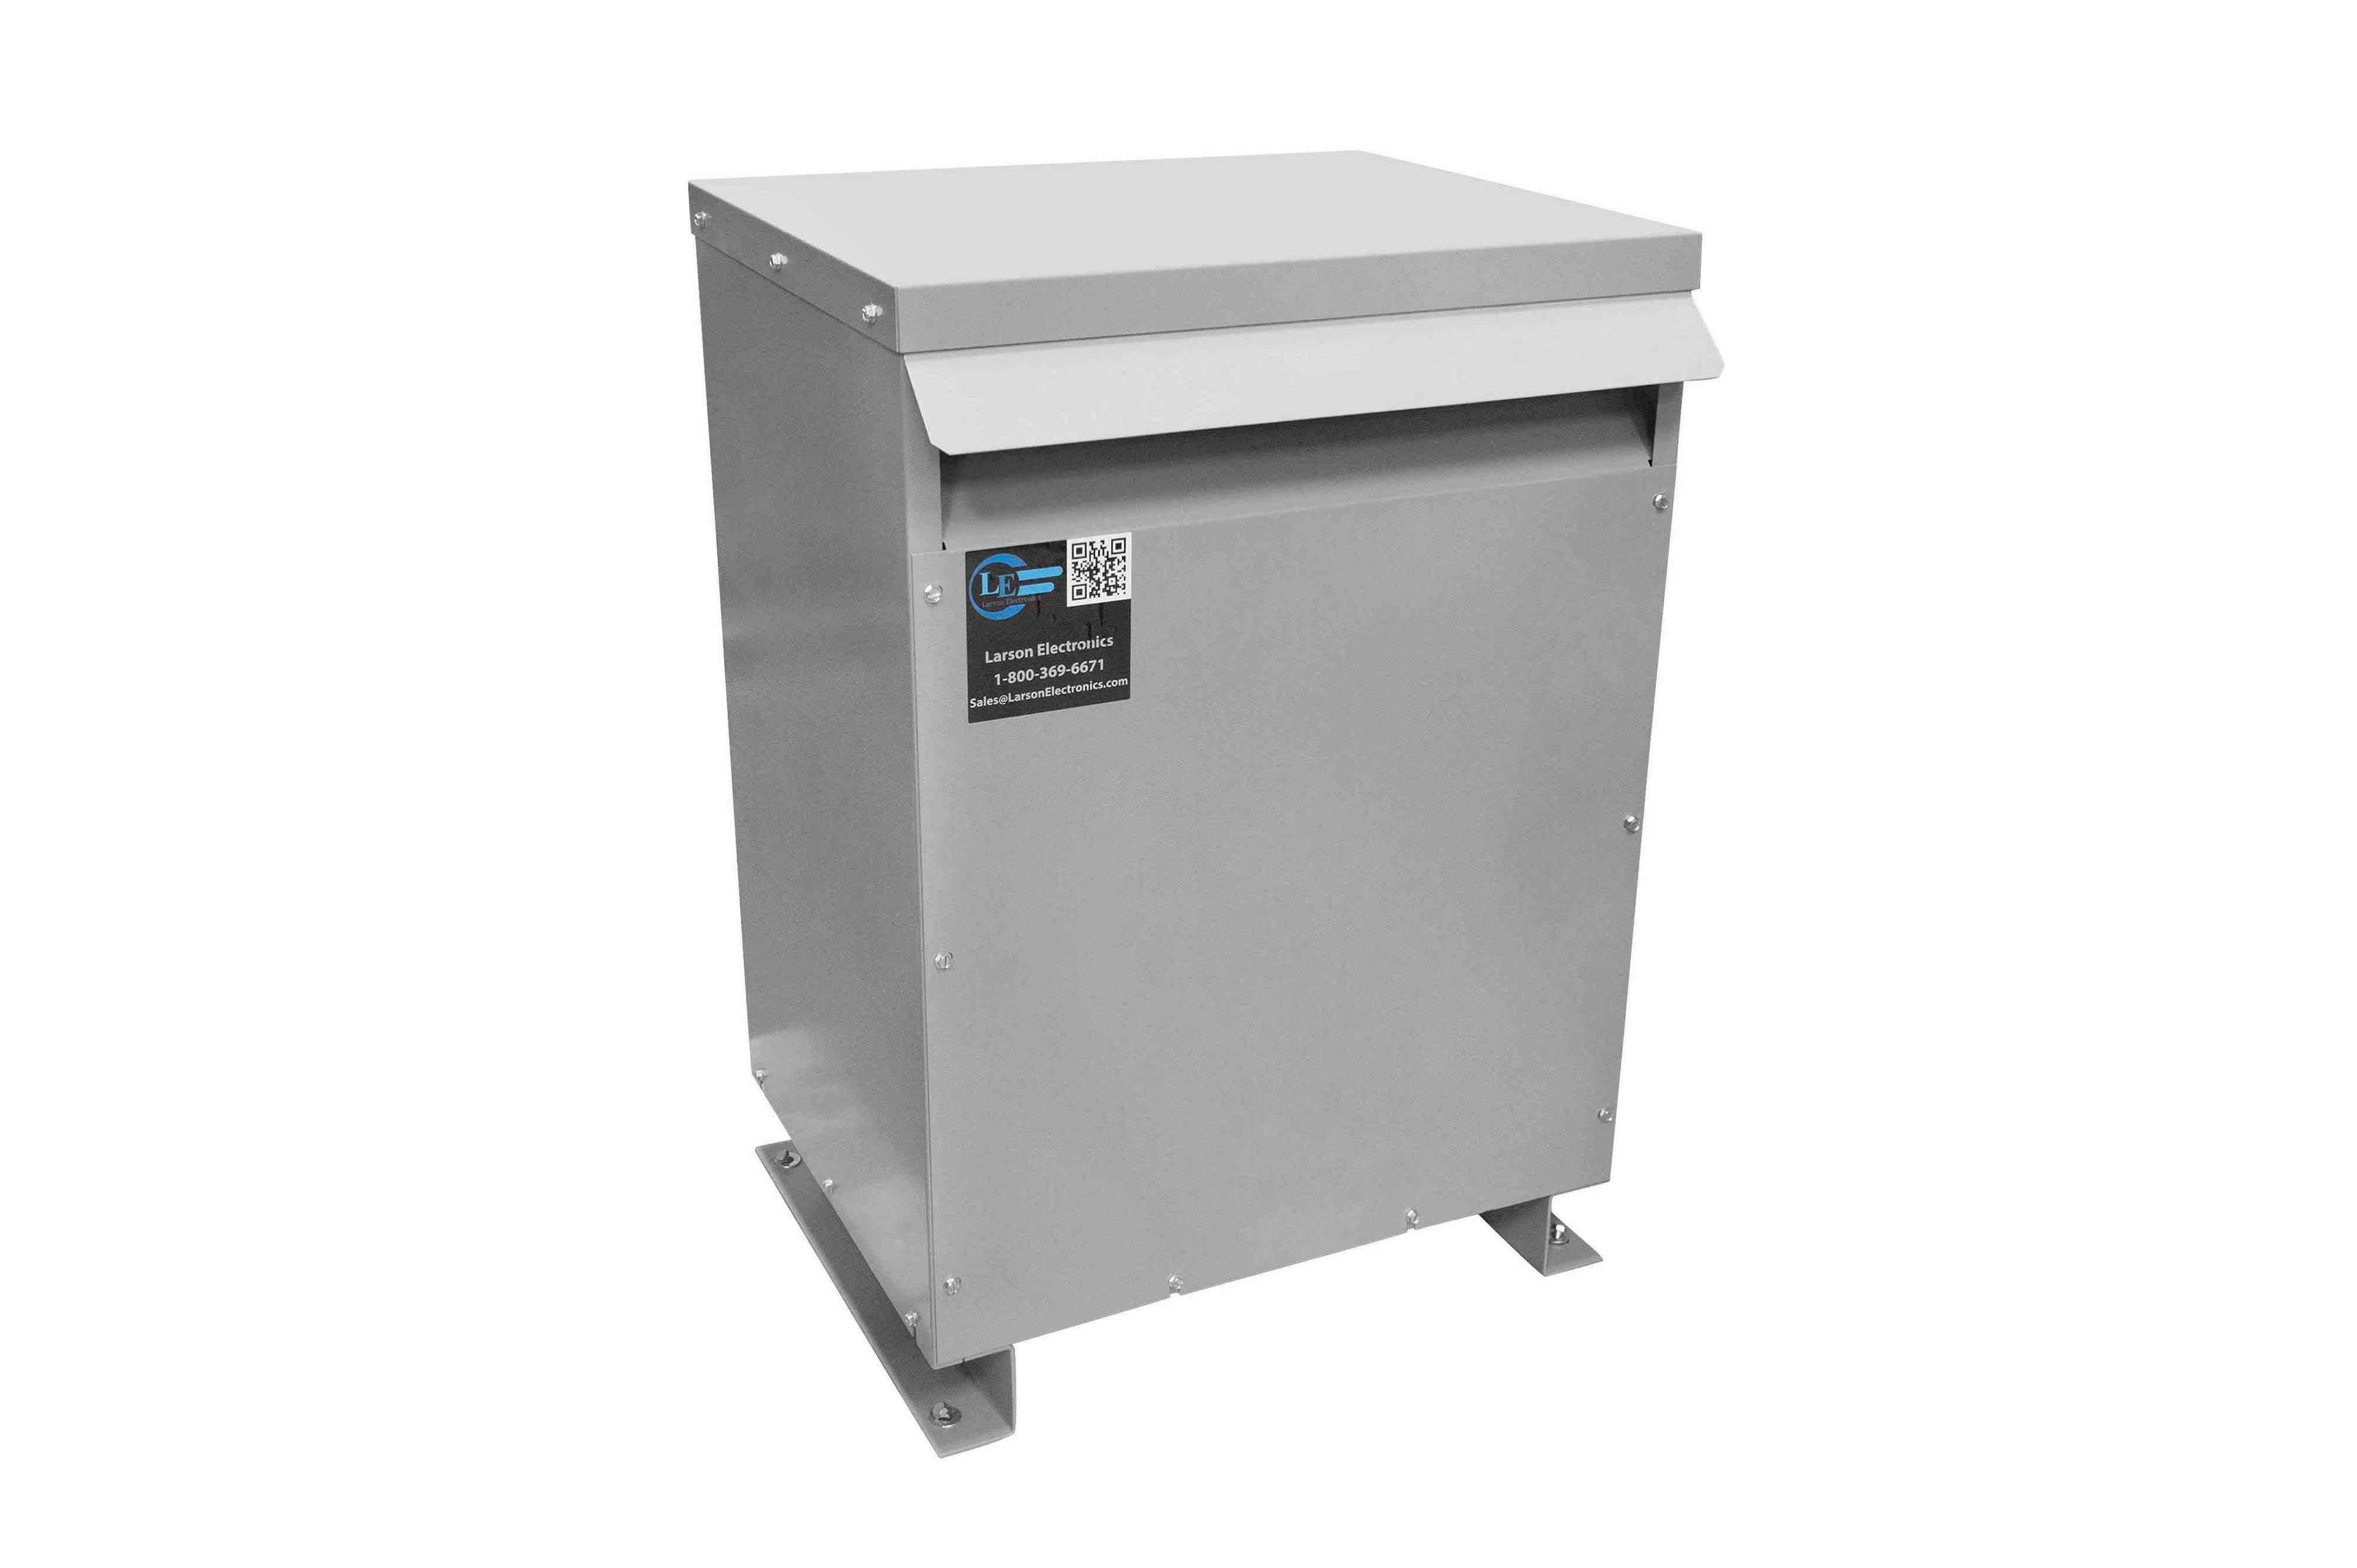 28 kVA 3PH Isolation Transformer, 415V Wye Primary, 208Y/120 Wye-N Secondary, N3R, Ventilated, 60 Hz